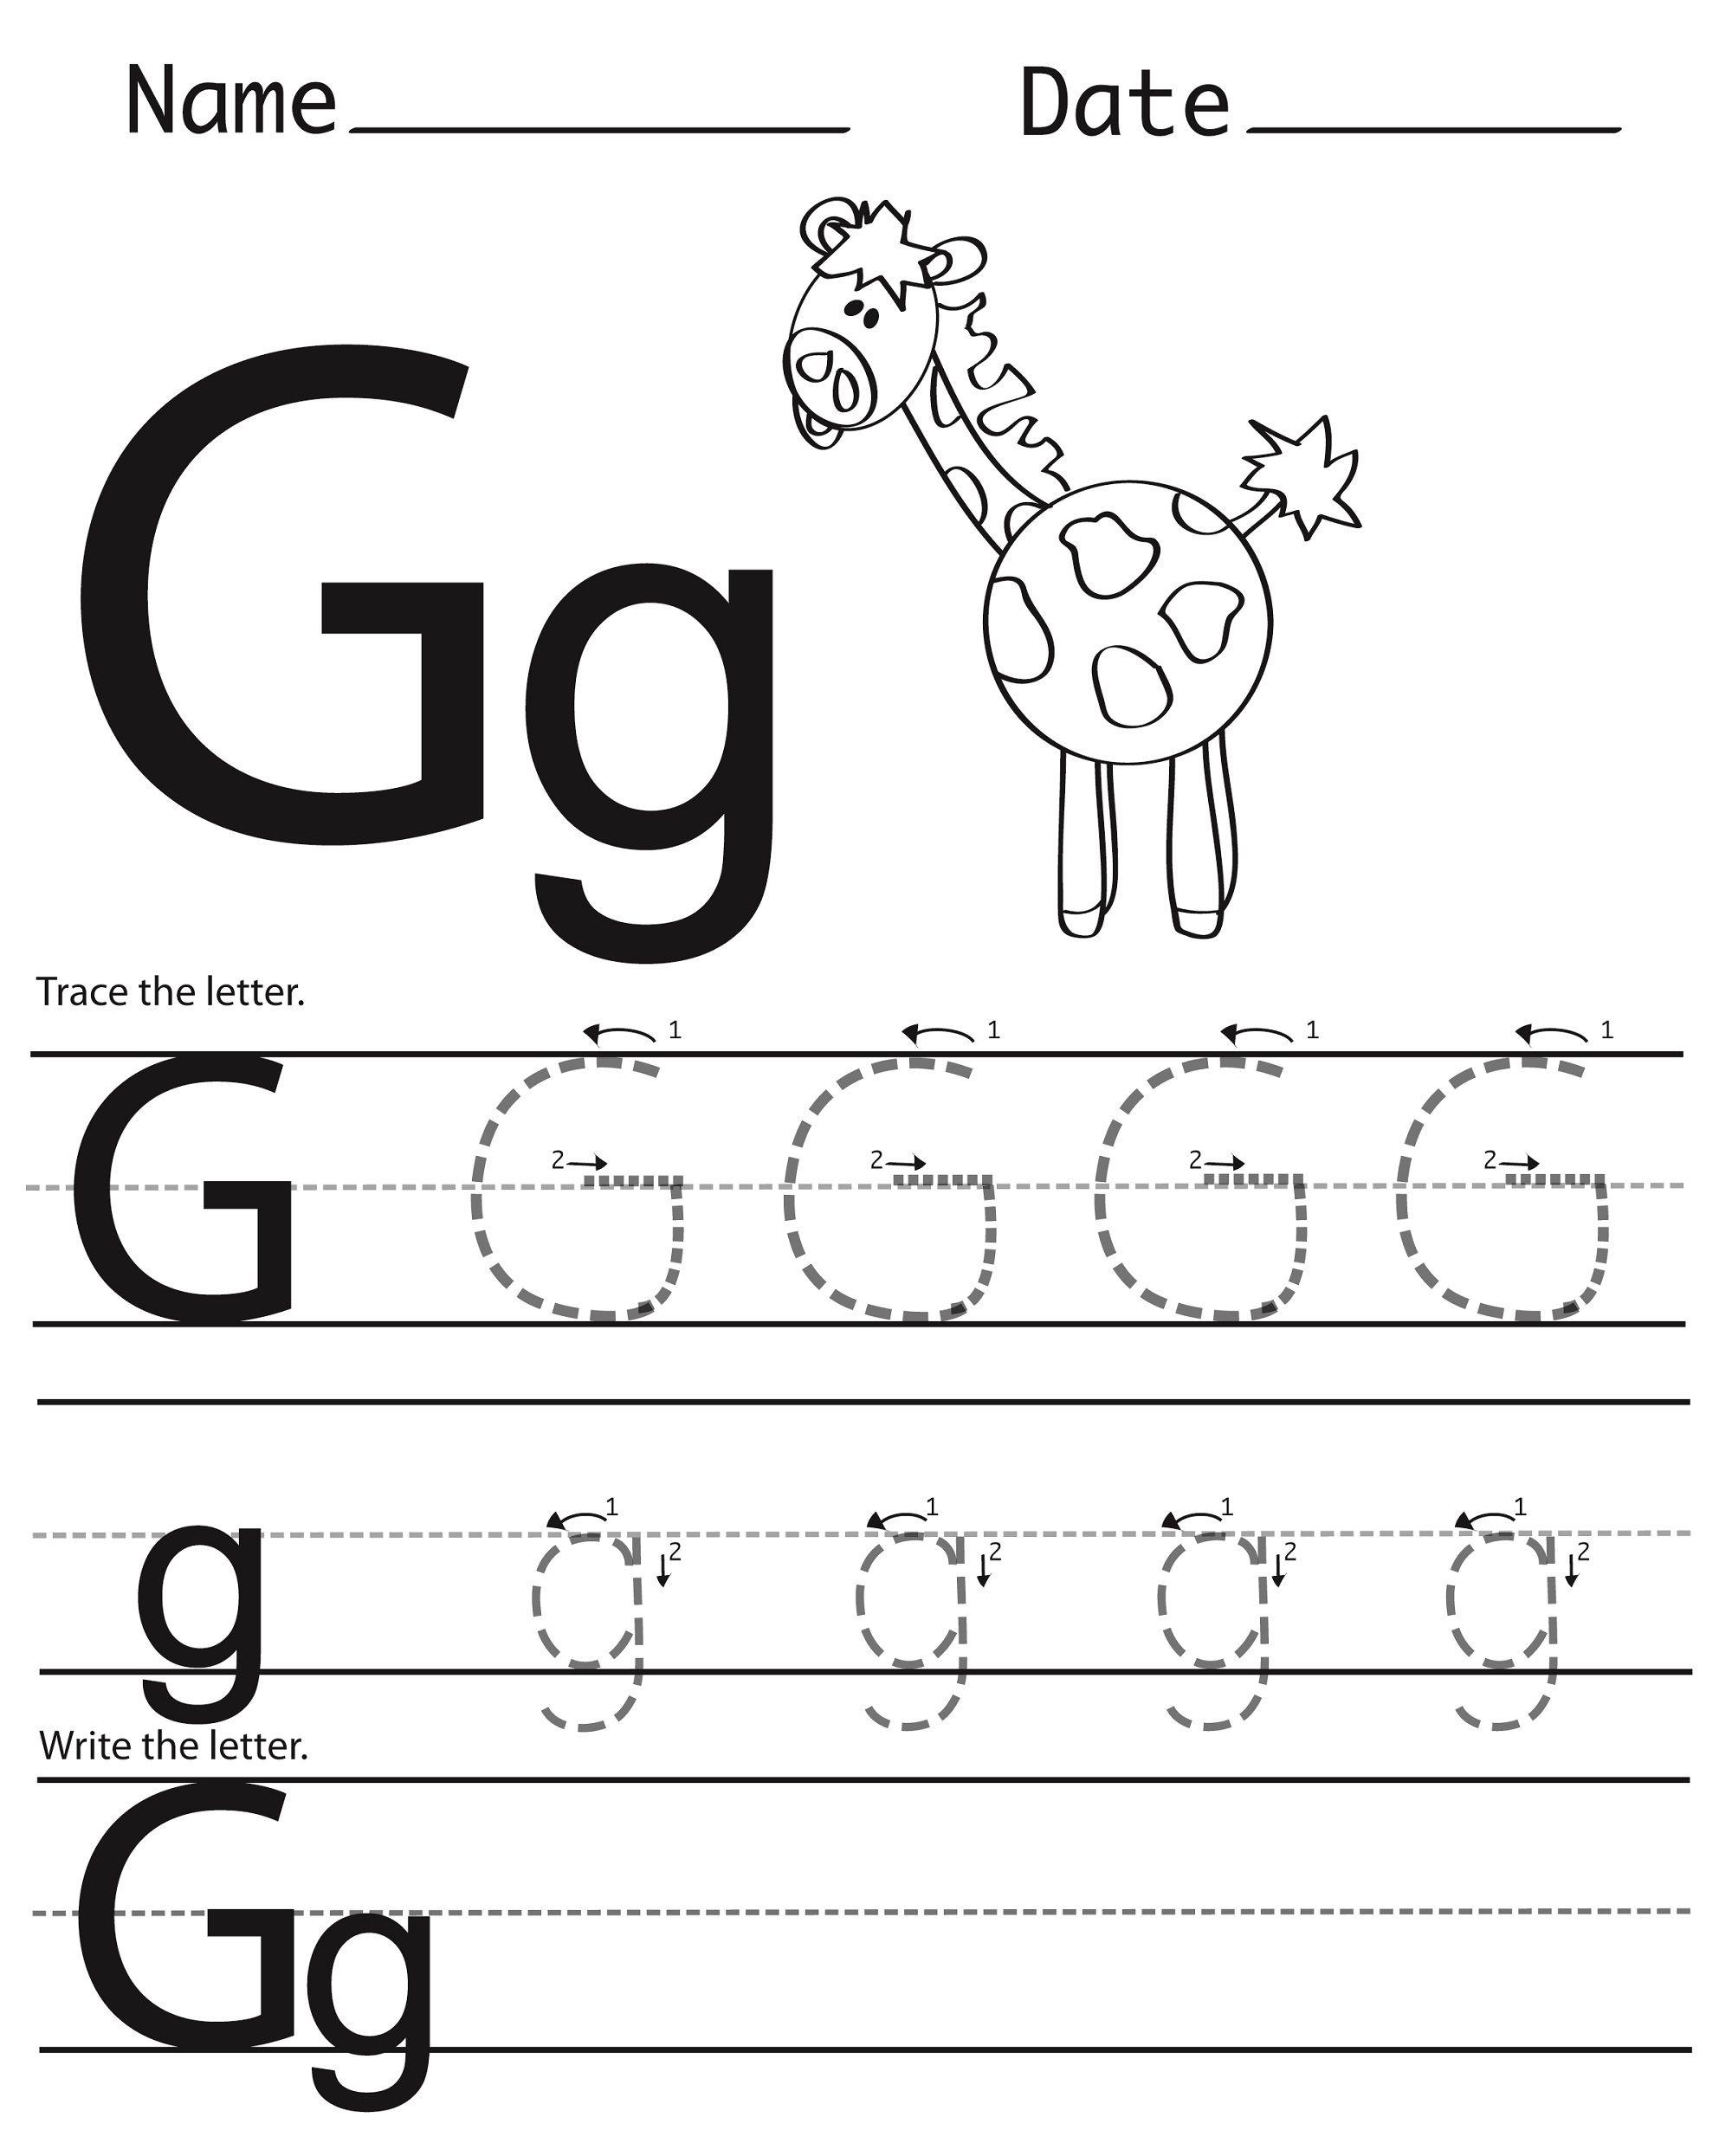 Trace Letter G For Better Handwriting